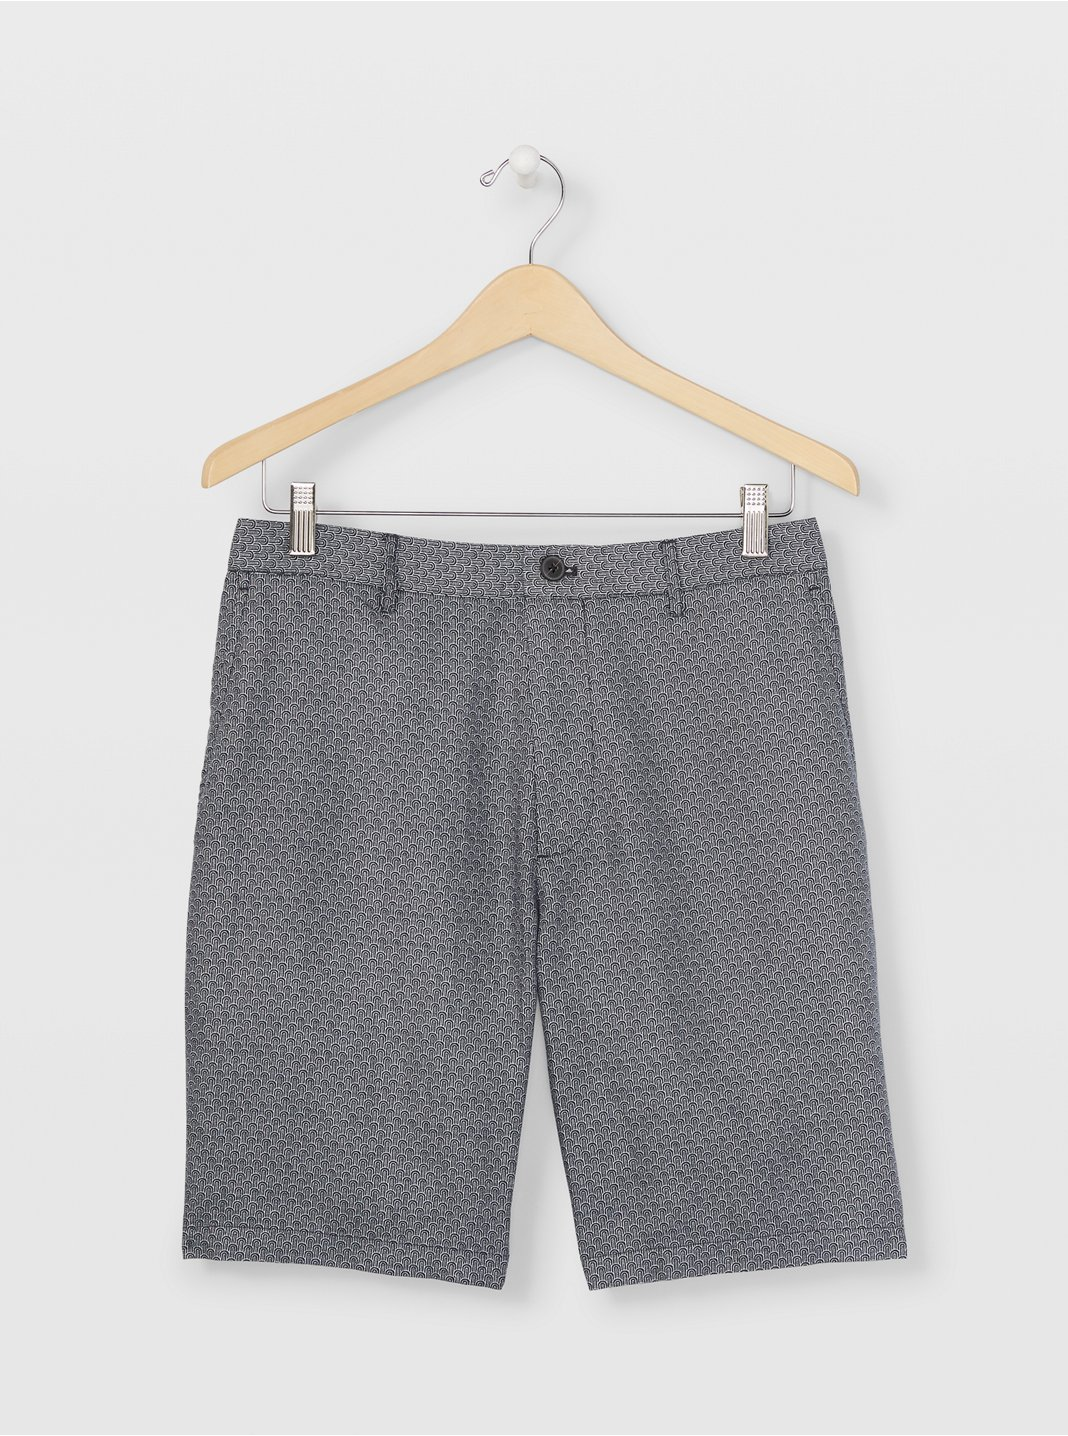 "Maddox Arch Print 9"" Shorts"